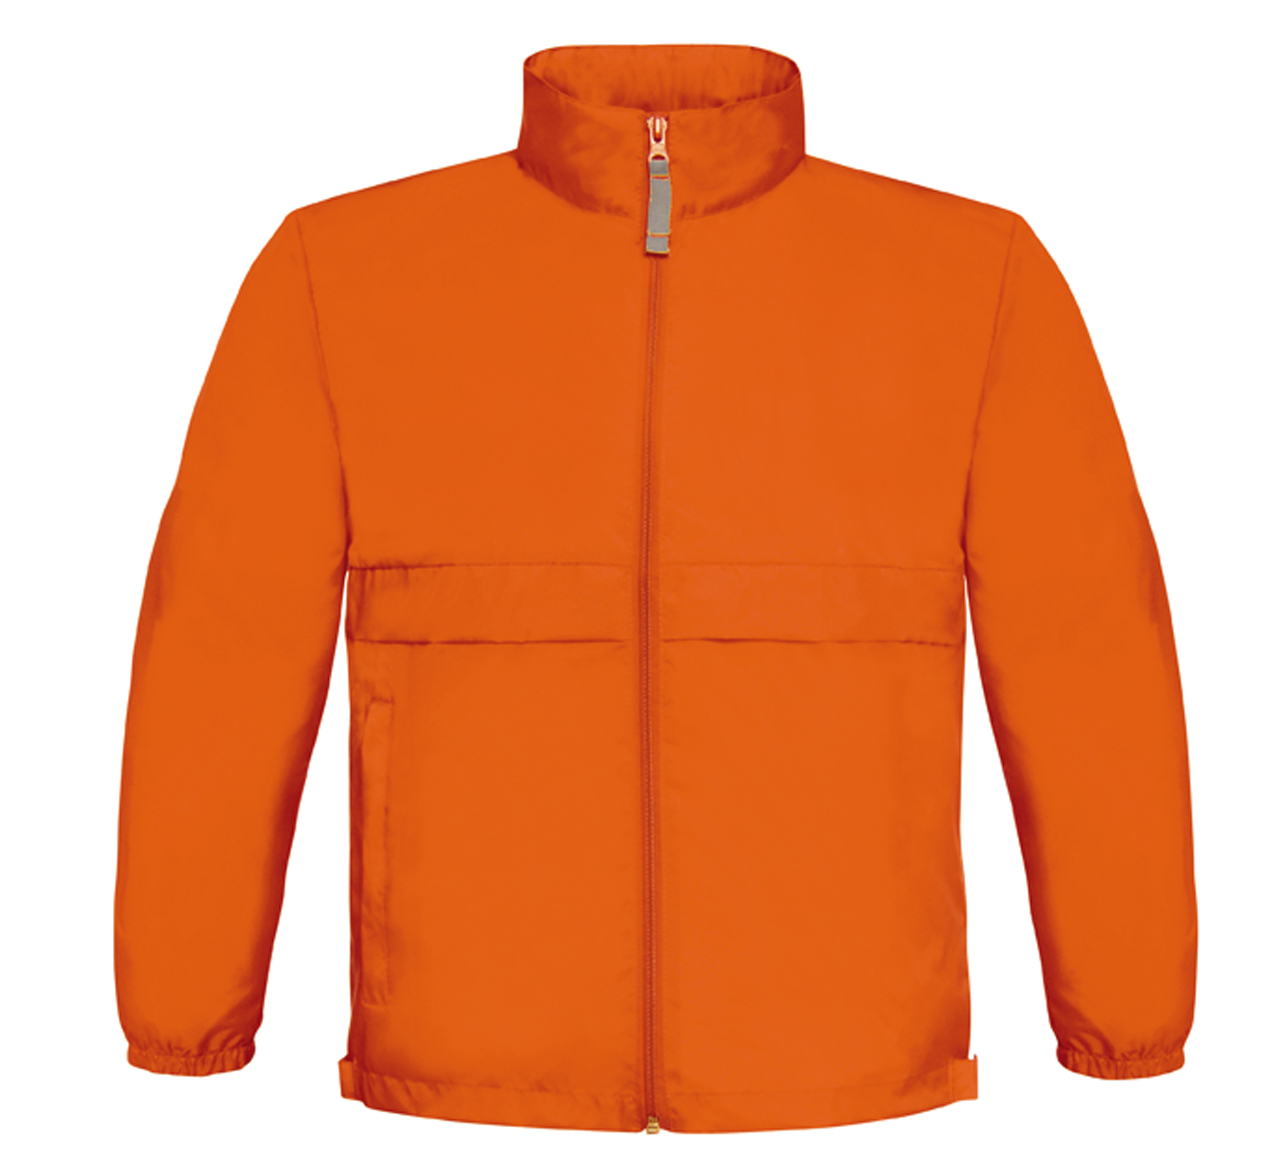 Sirocco Windbreaker Orange